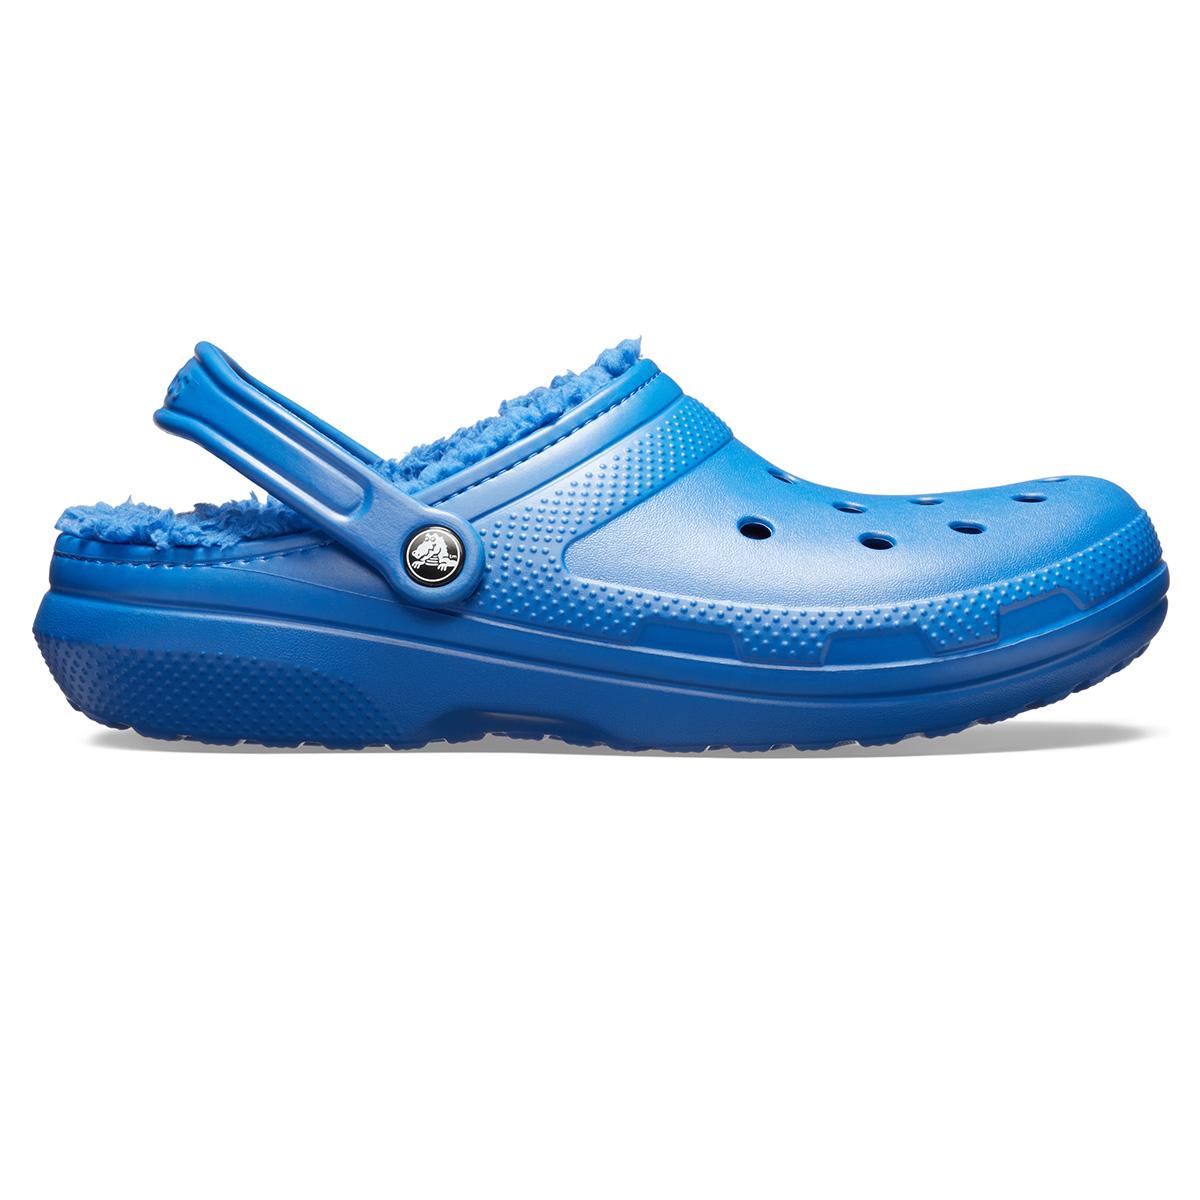 Classic Lined Clog - Mavi Jean/Mavi Jean